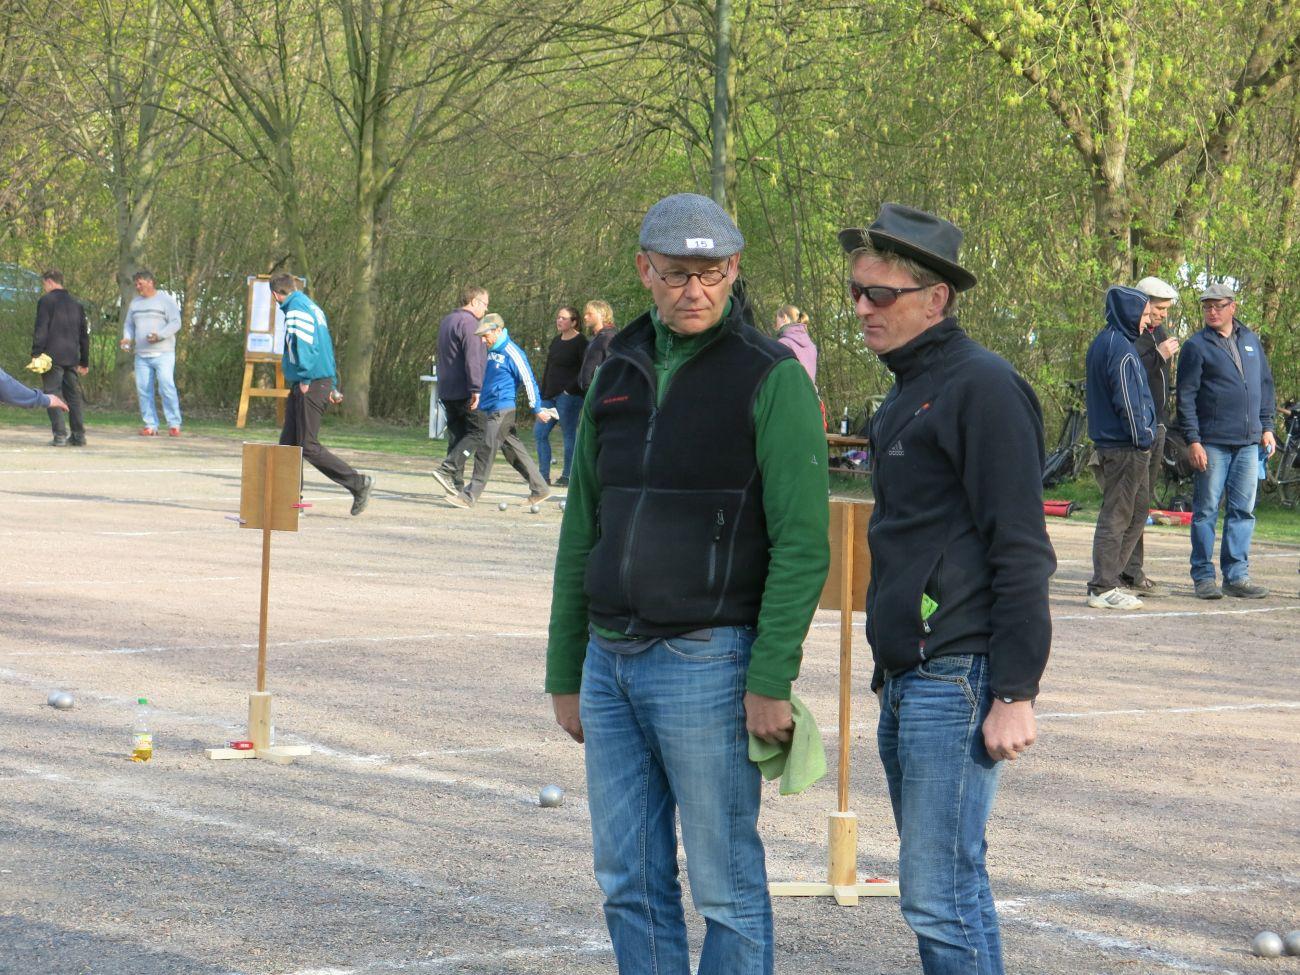 Leipziger Stadtmeisterschaft 2015 005.jpg